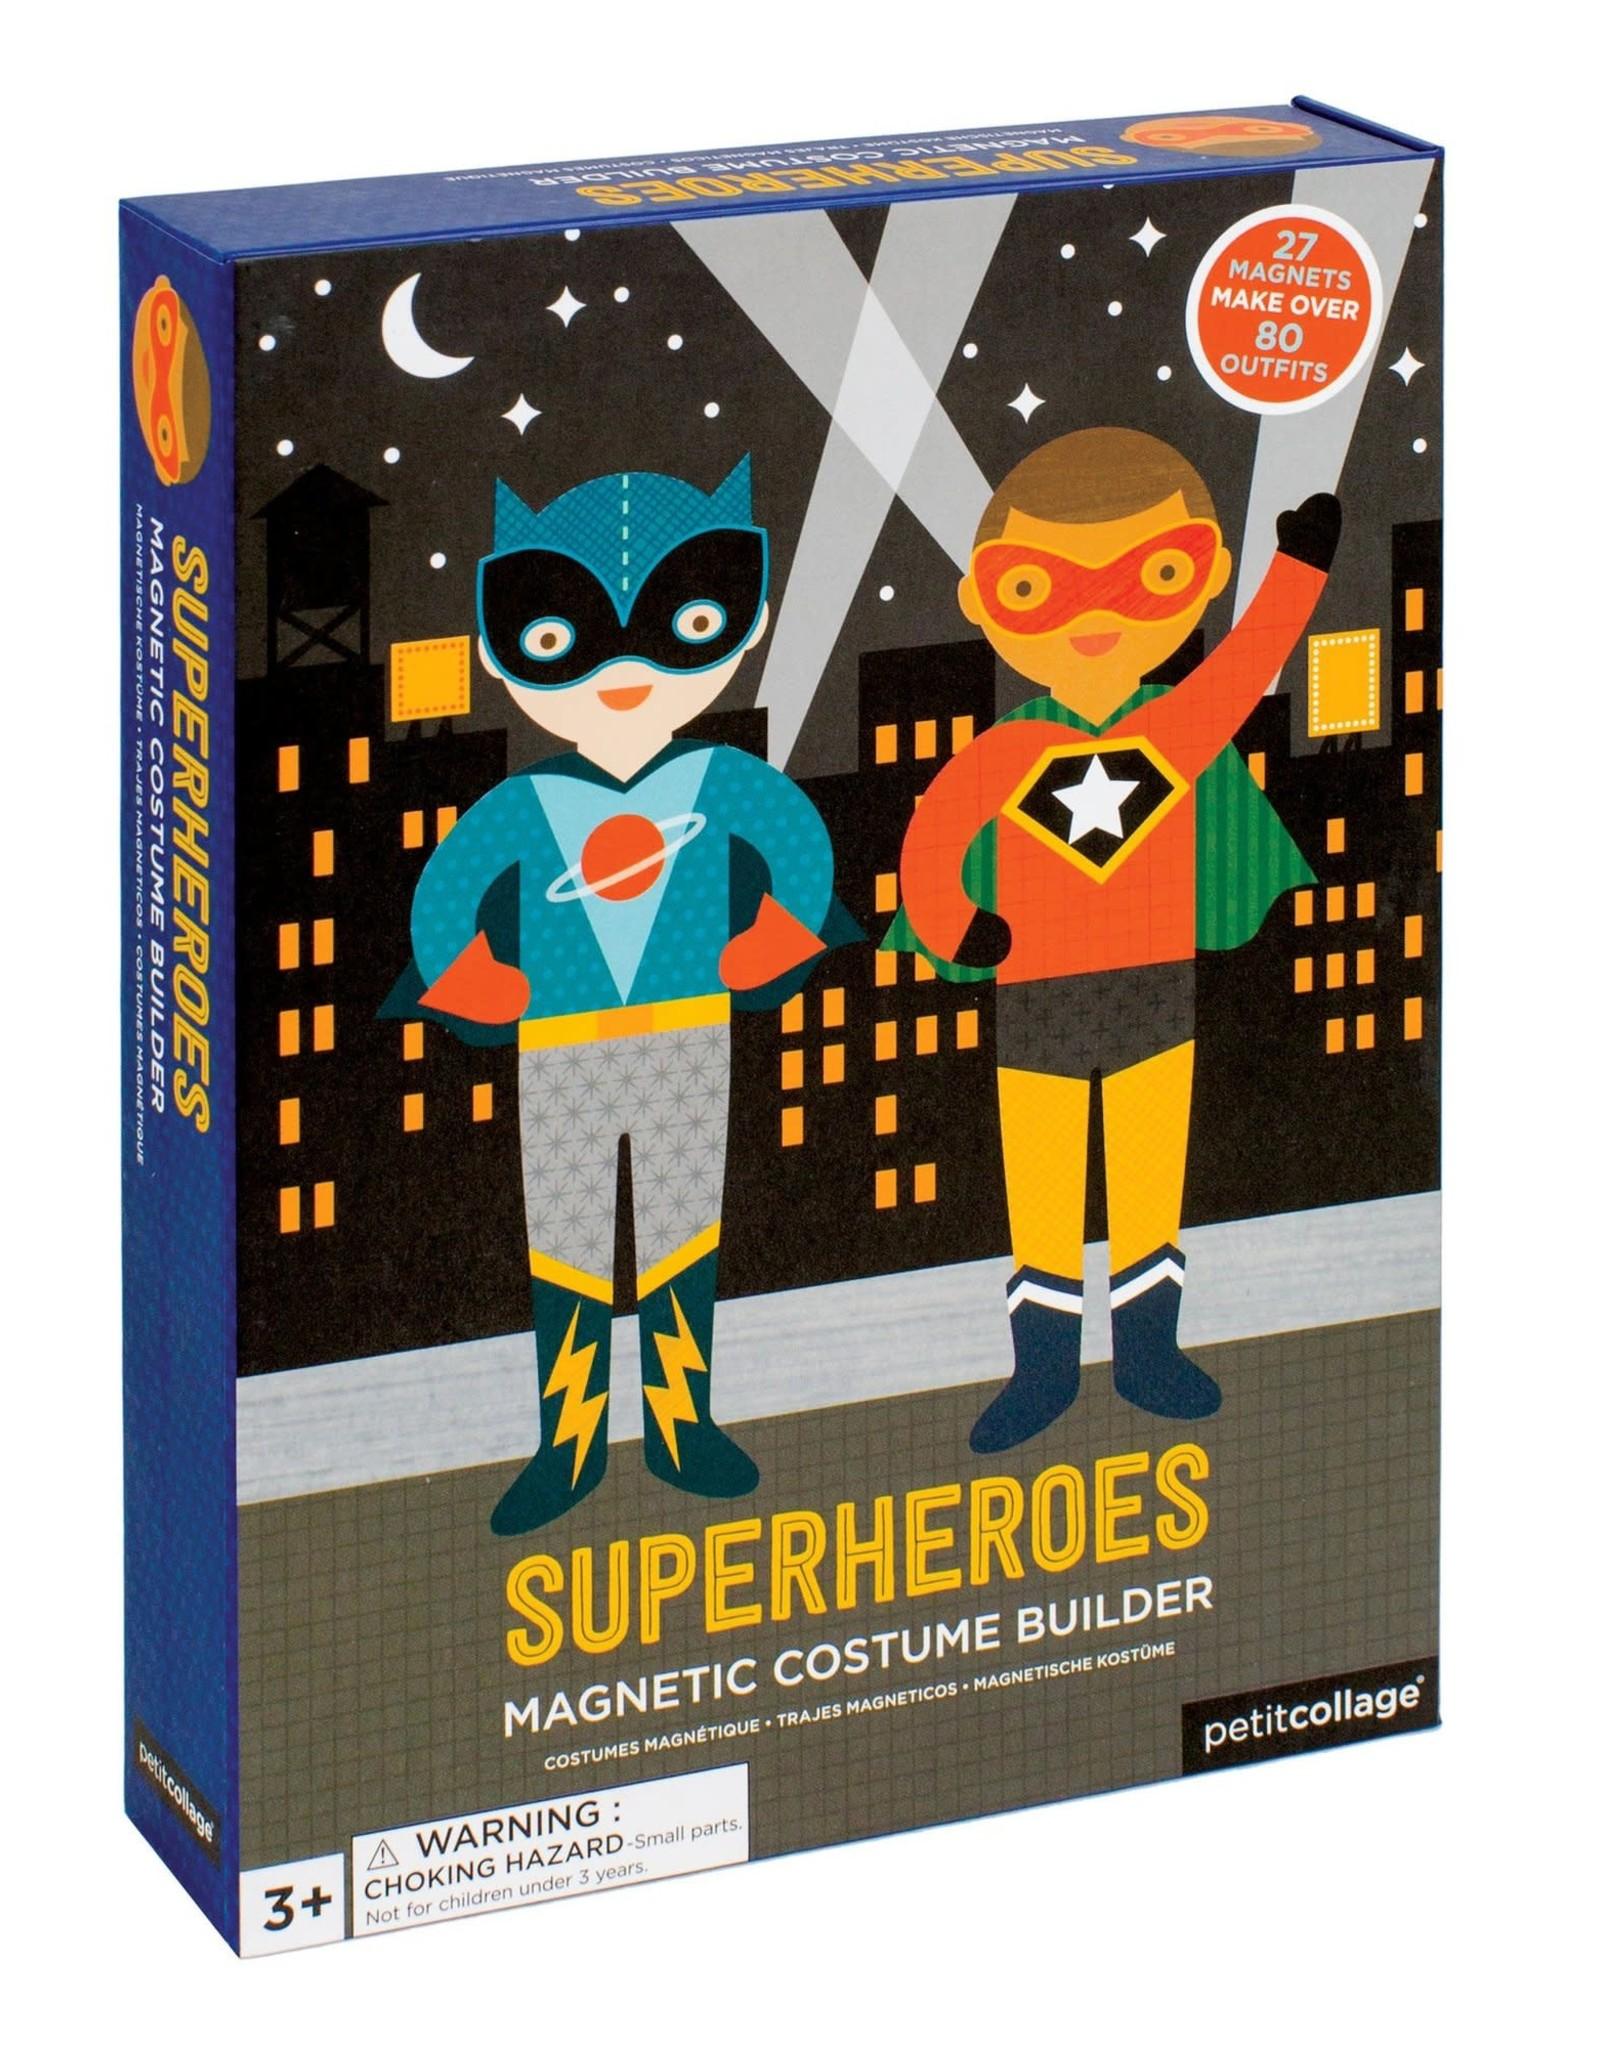 Superheroes Magnetic Costume Builder